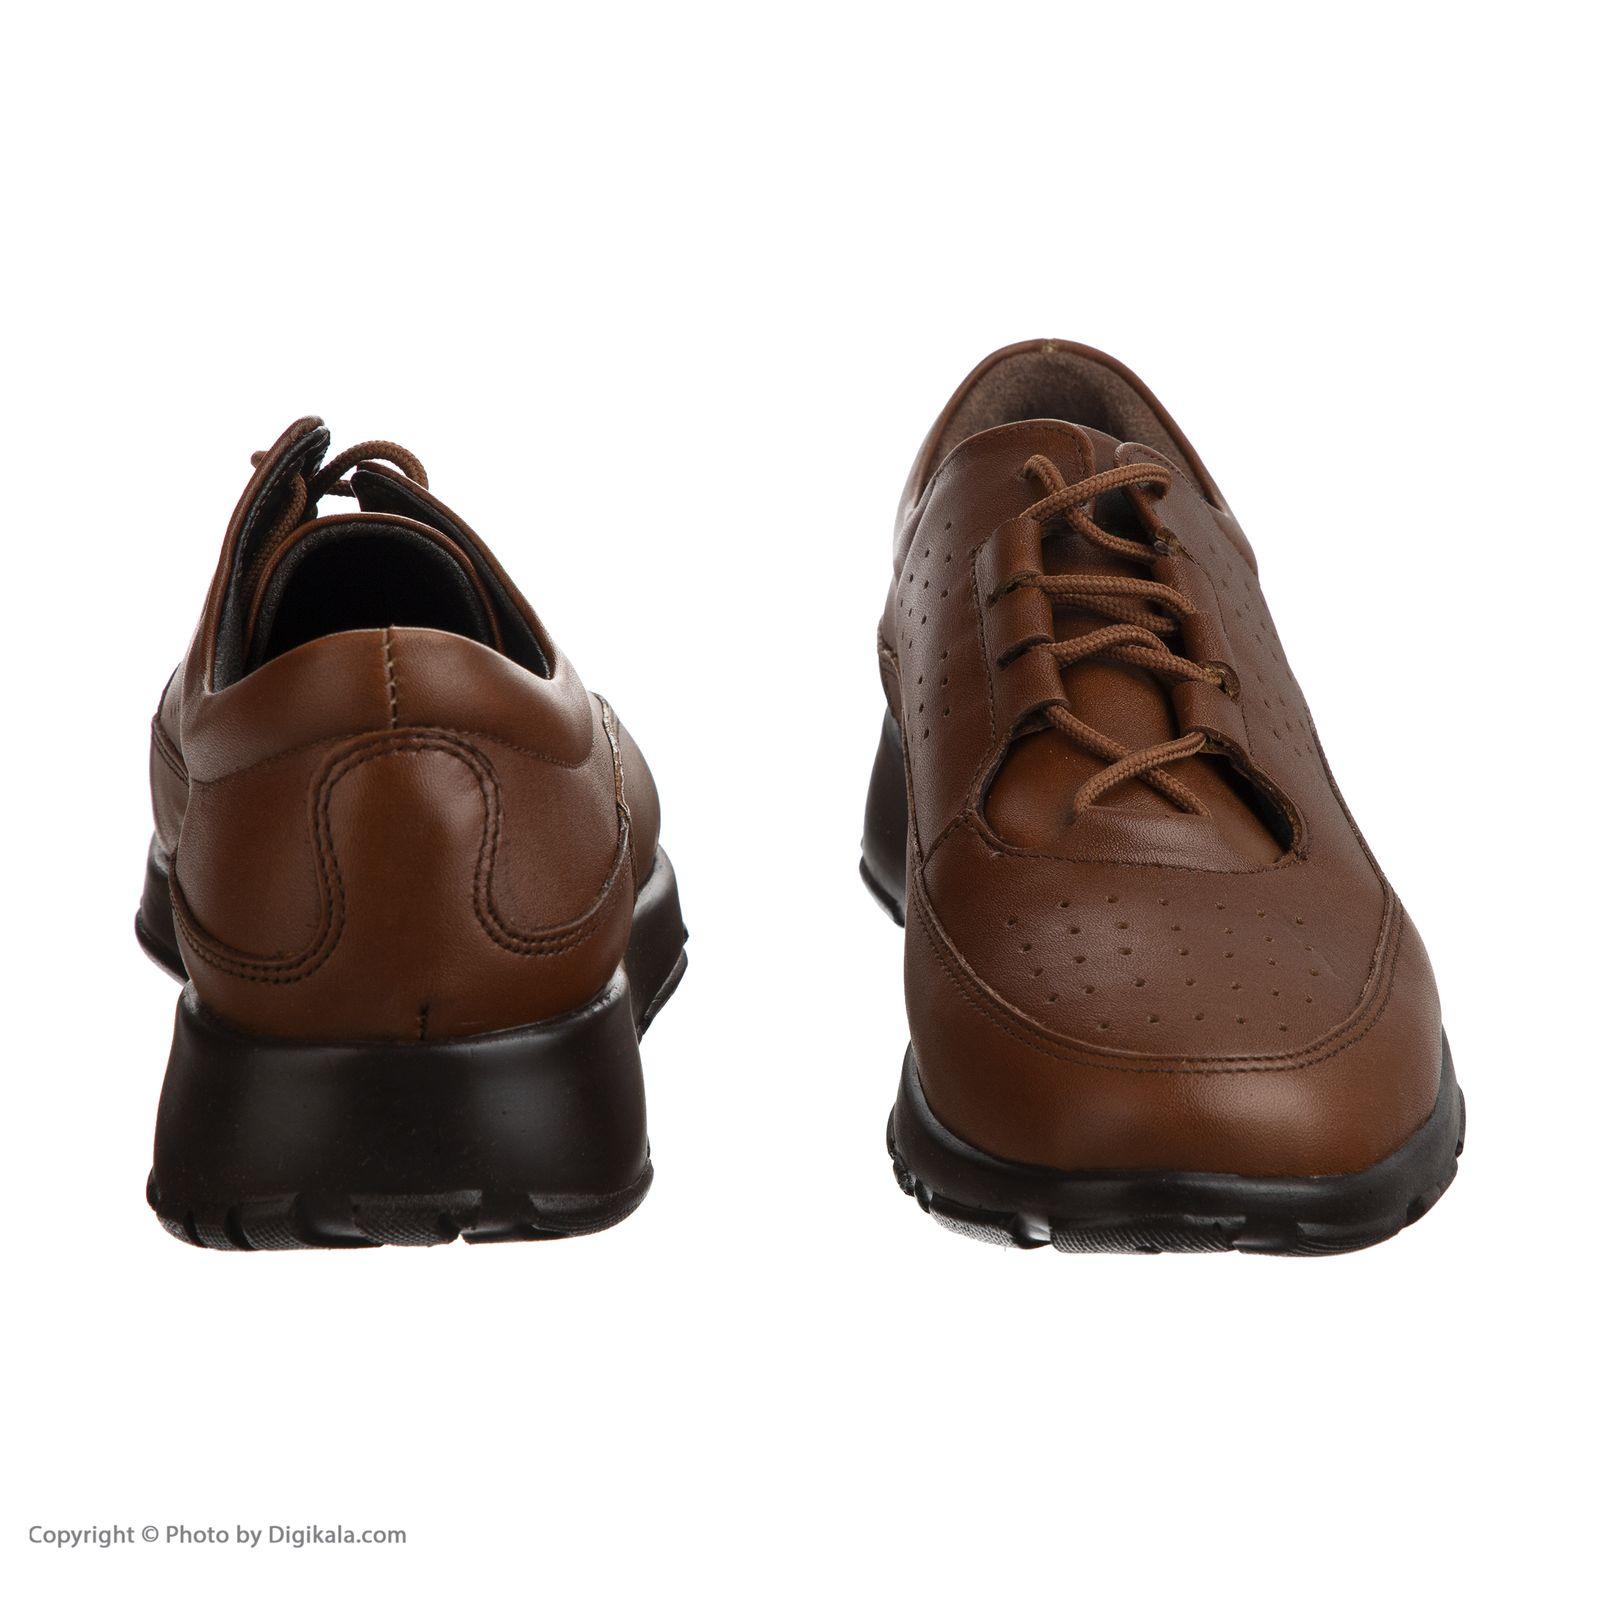 کفش روزمره زنانه شیفر مدل 5289A500136 -  - 4